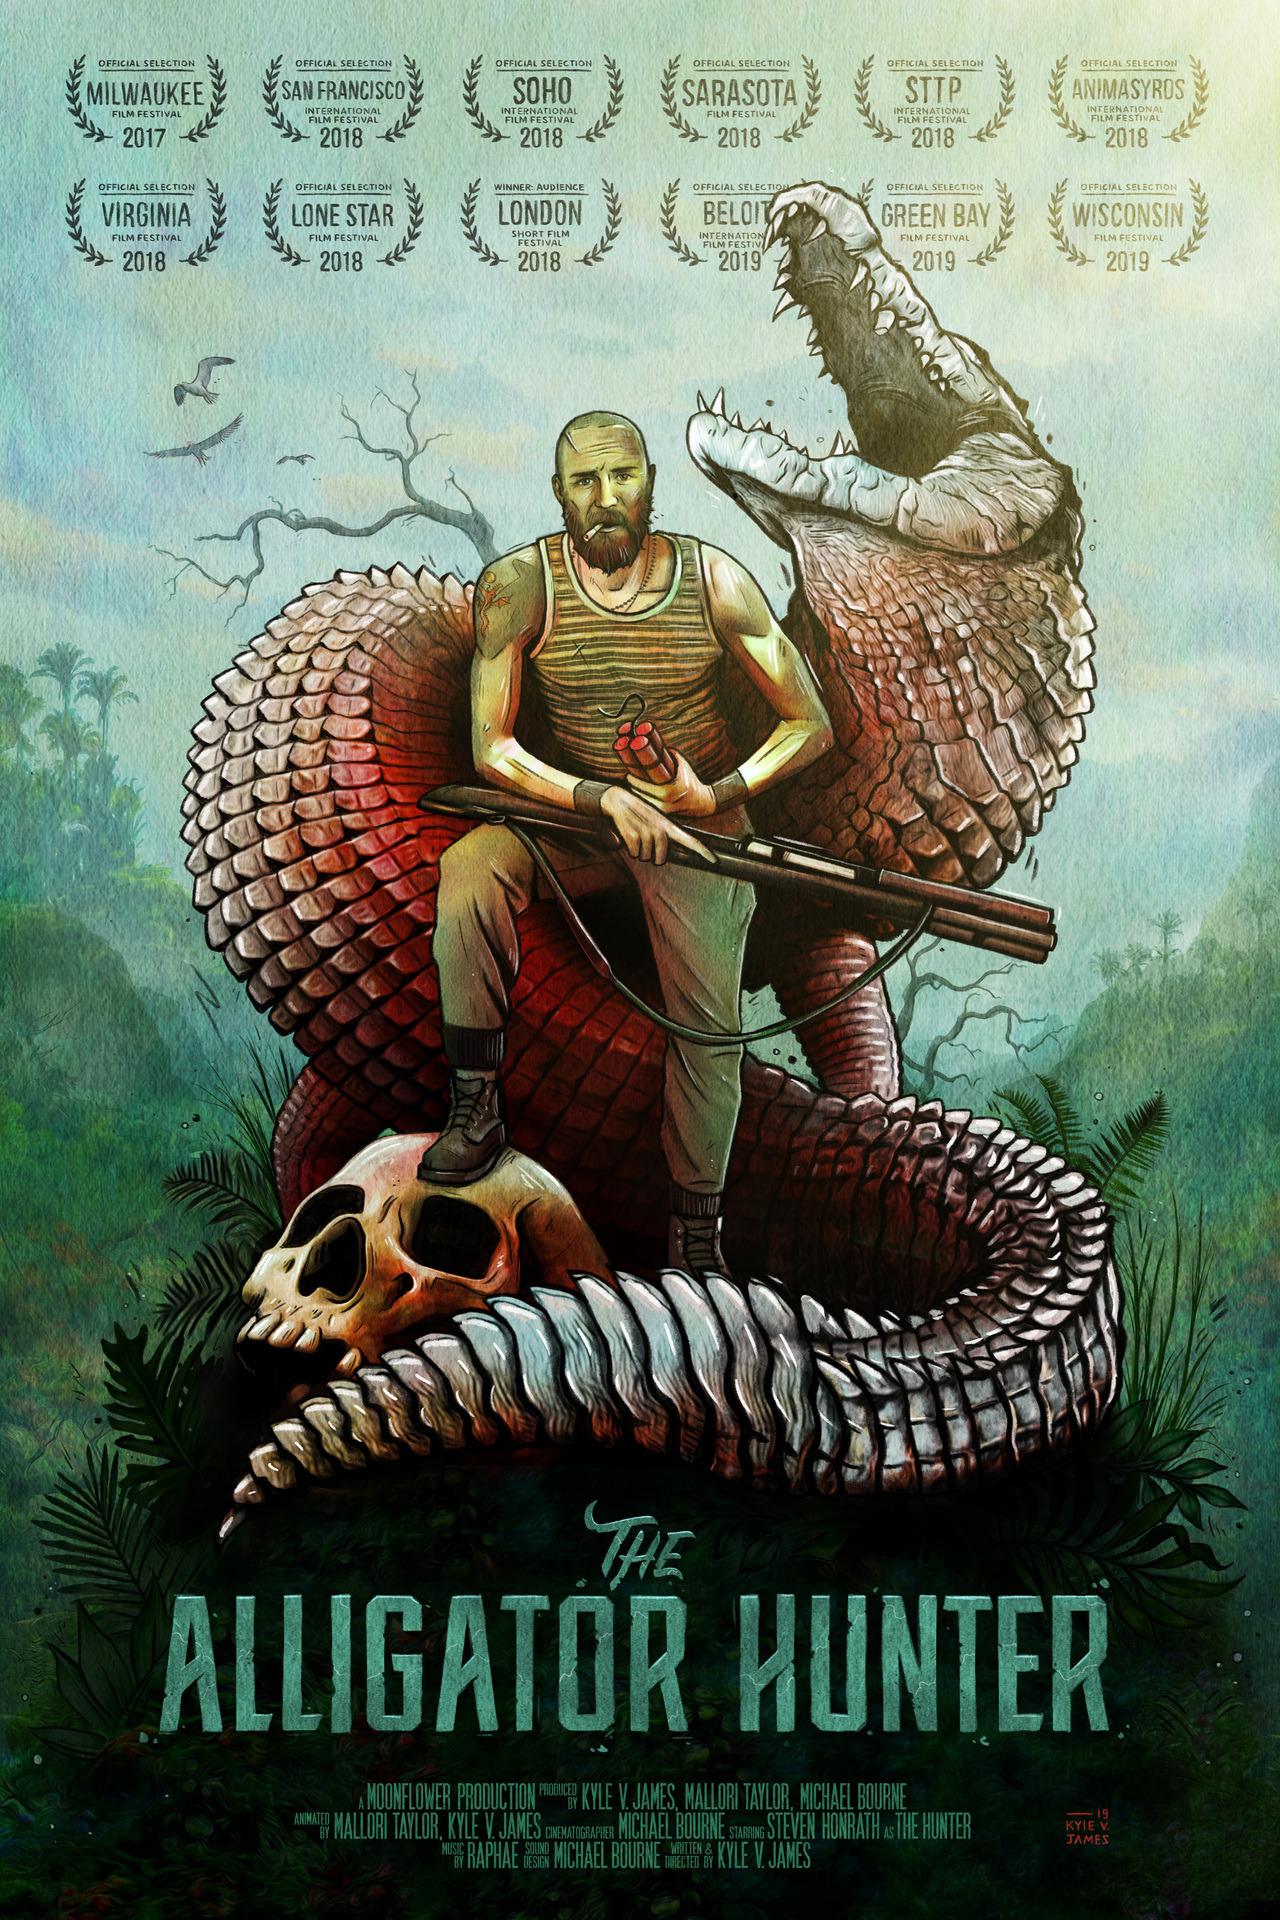 Poster Design - The Alligator Hunter